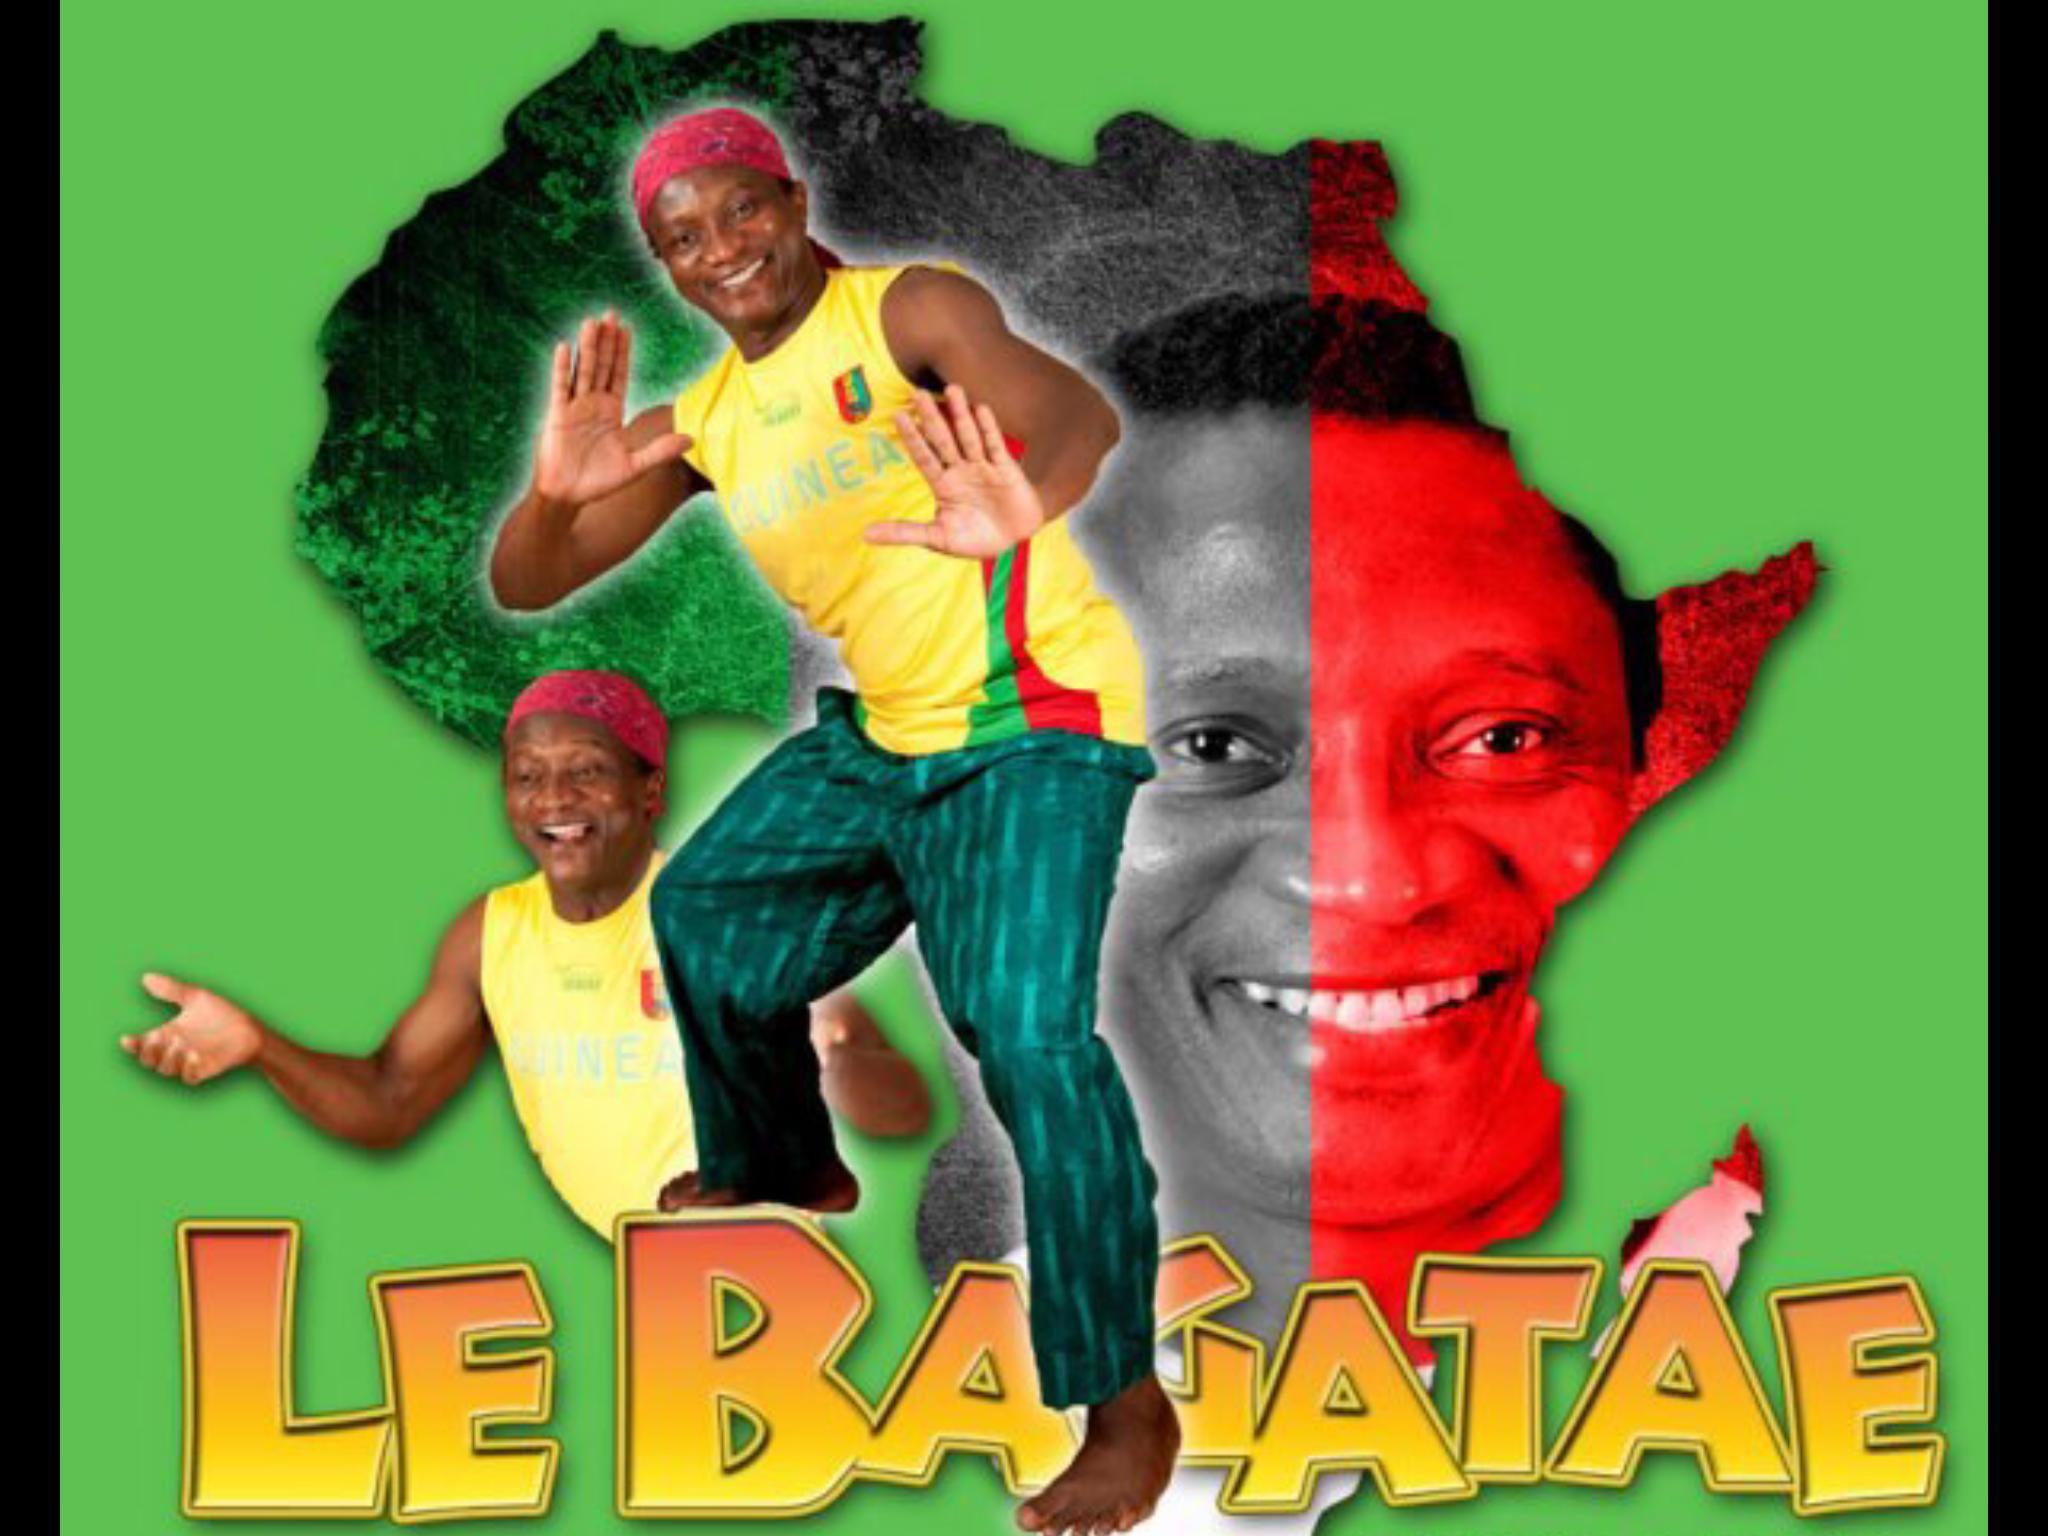 Le Bagatae Flyer.PNG